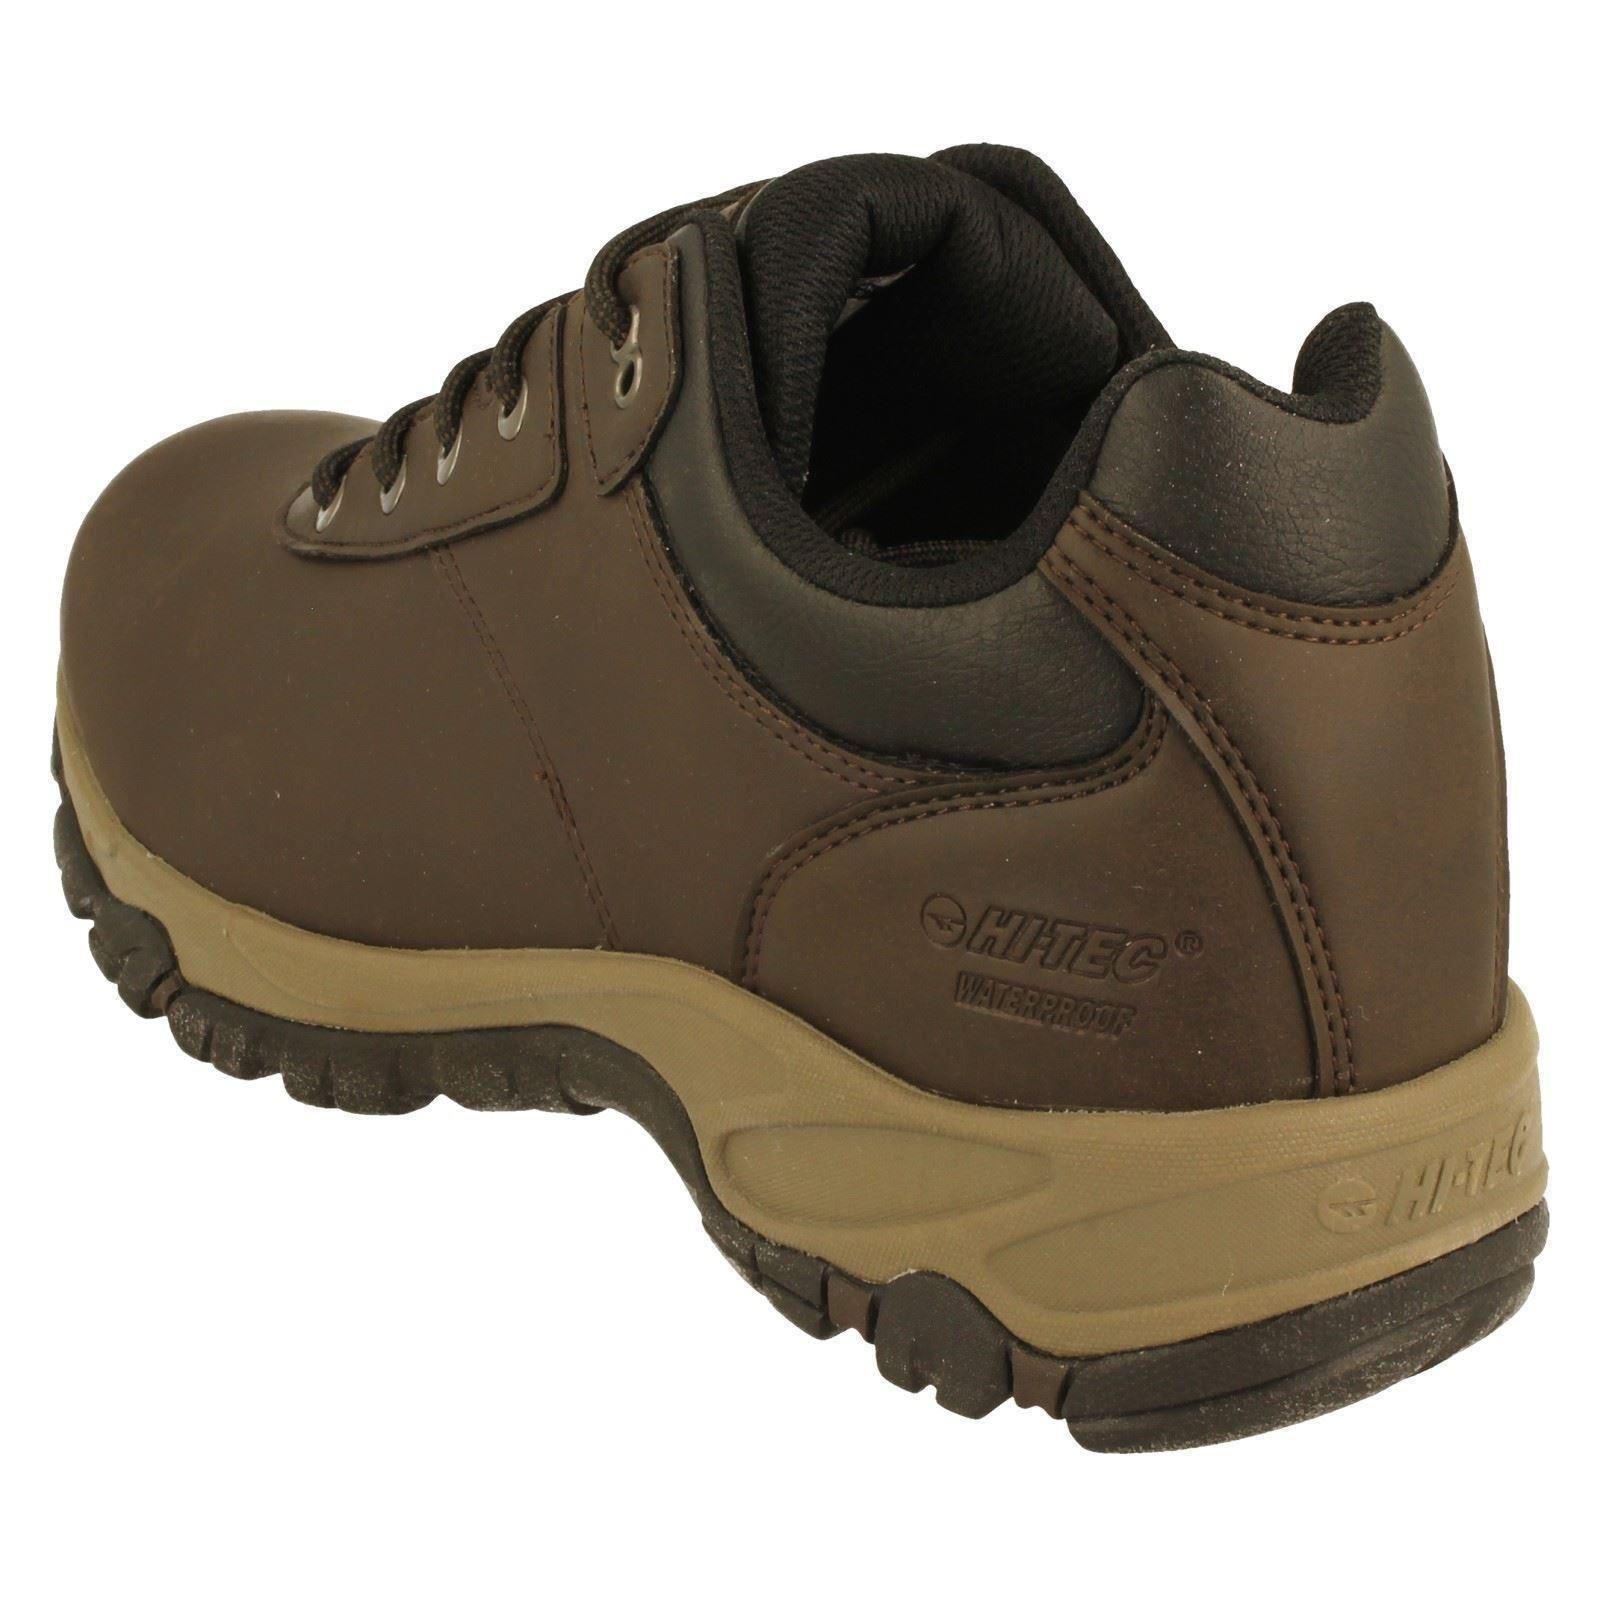 Schuhes  Herren Hi-Tec Walking Schuhes  Label Altitude V Niedrig I WP-W b861e8